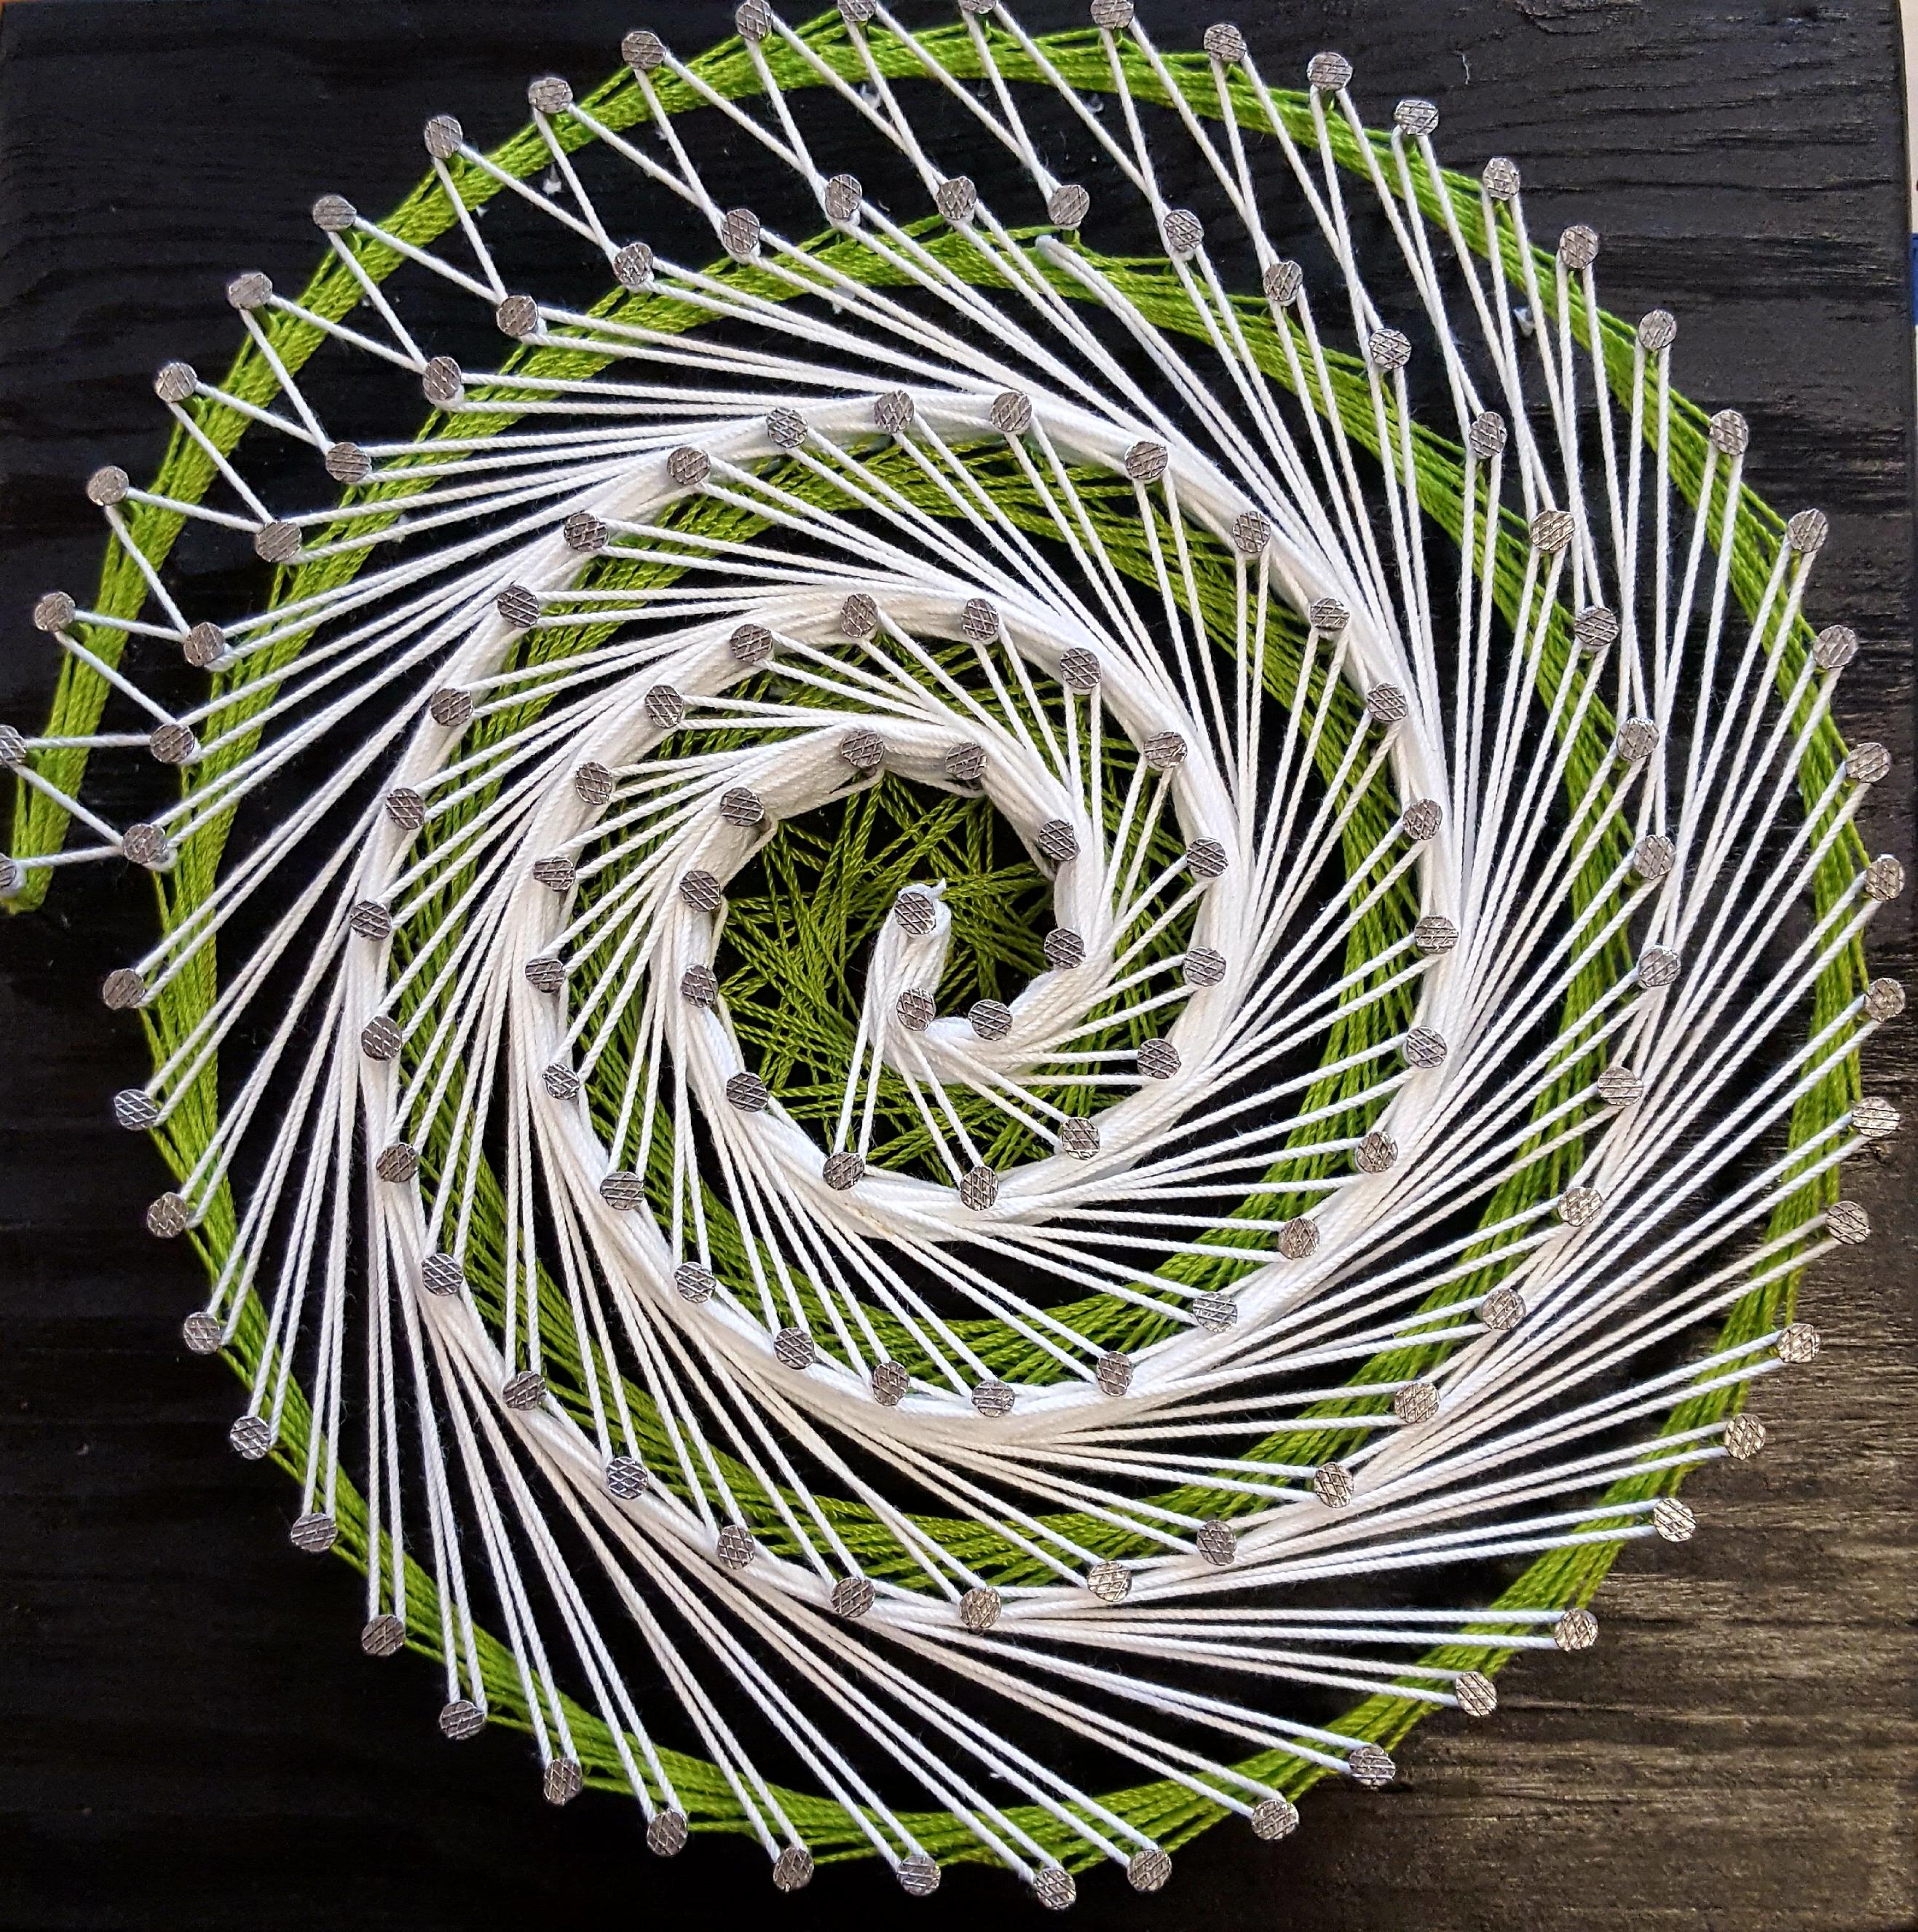 Spiral String Art